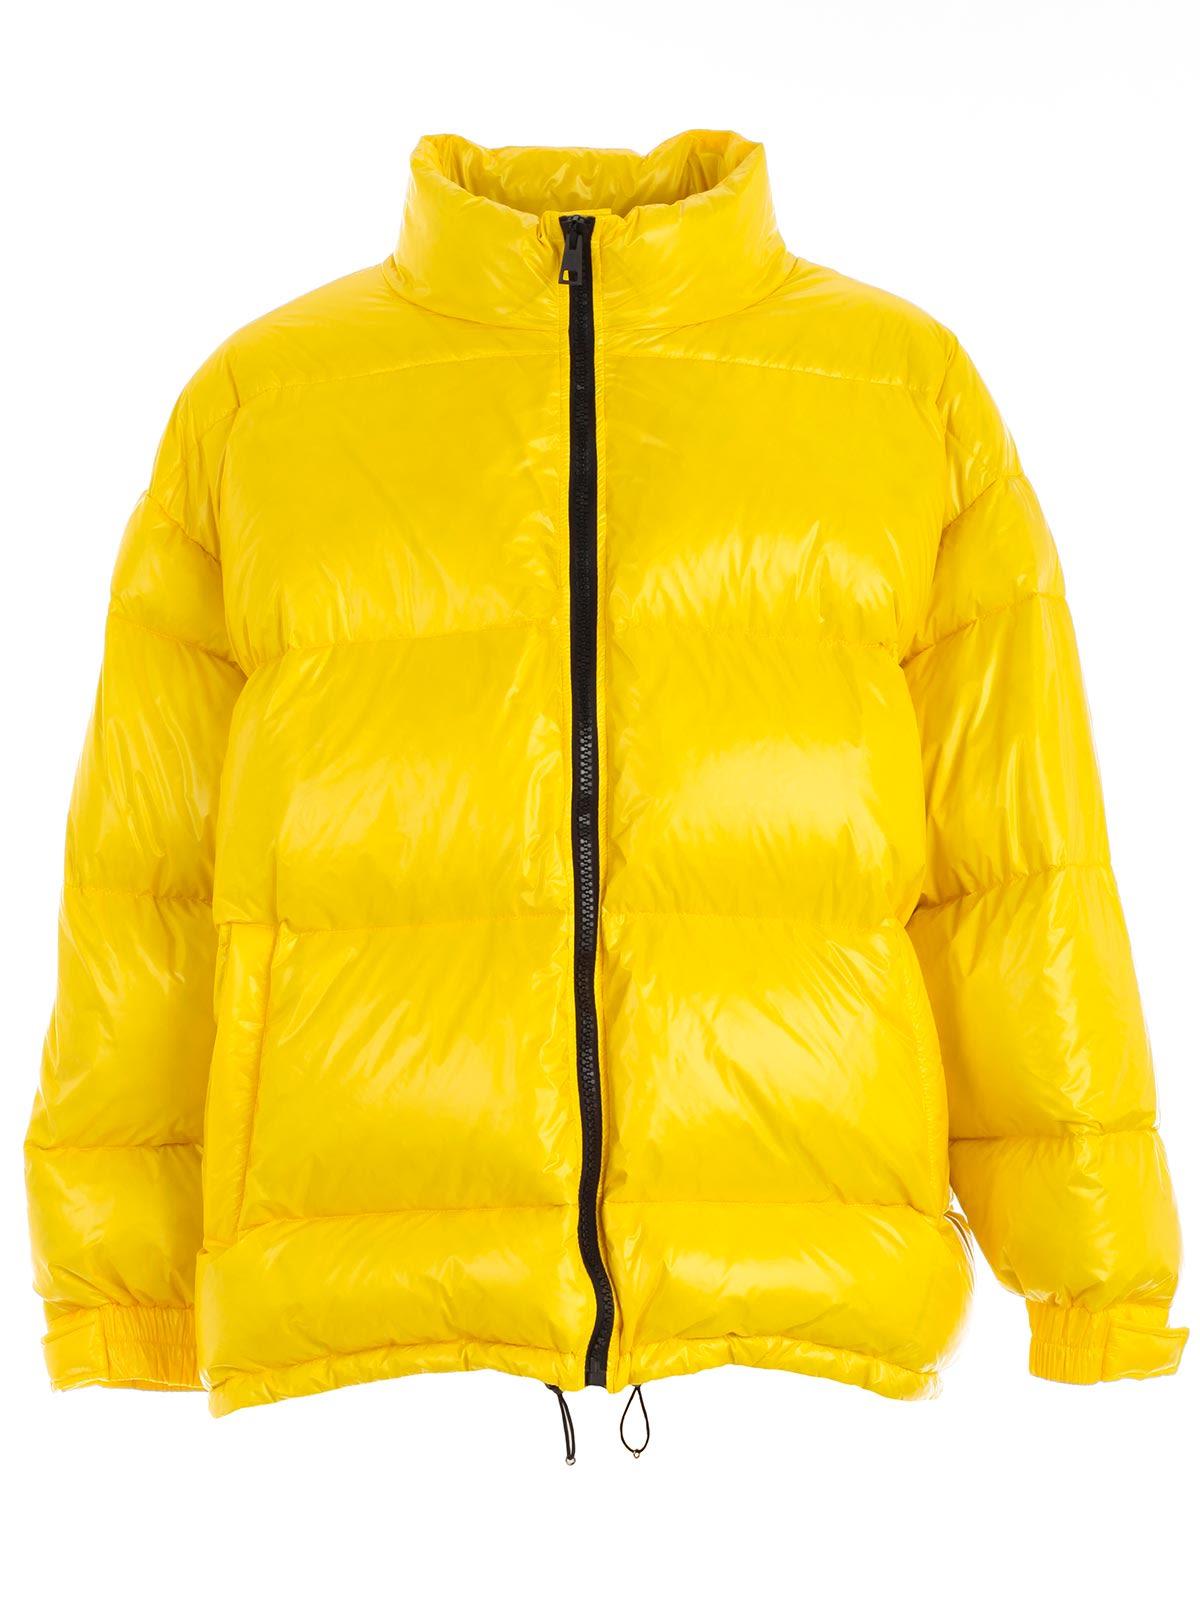 DANILO PAURA Zipped-Up Padded Jacket in Yellow